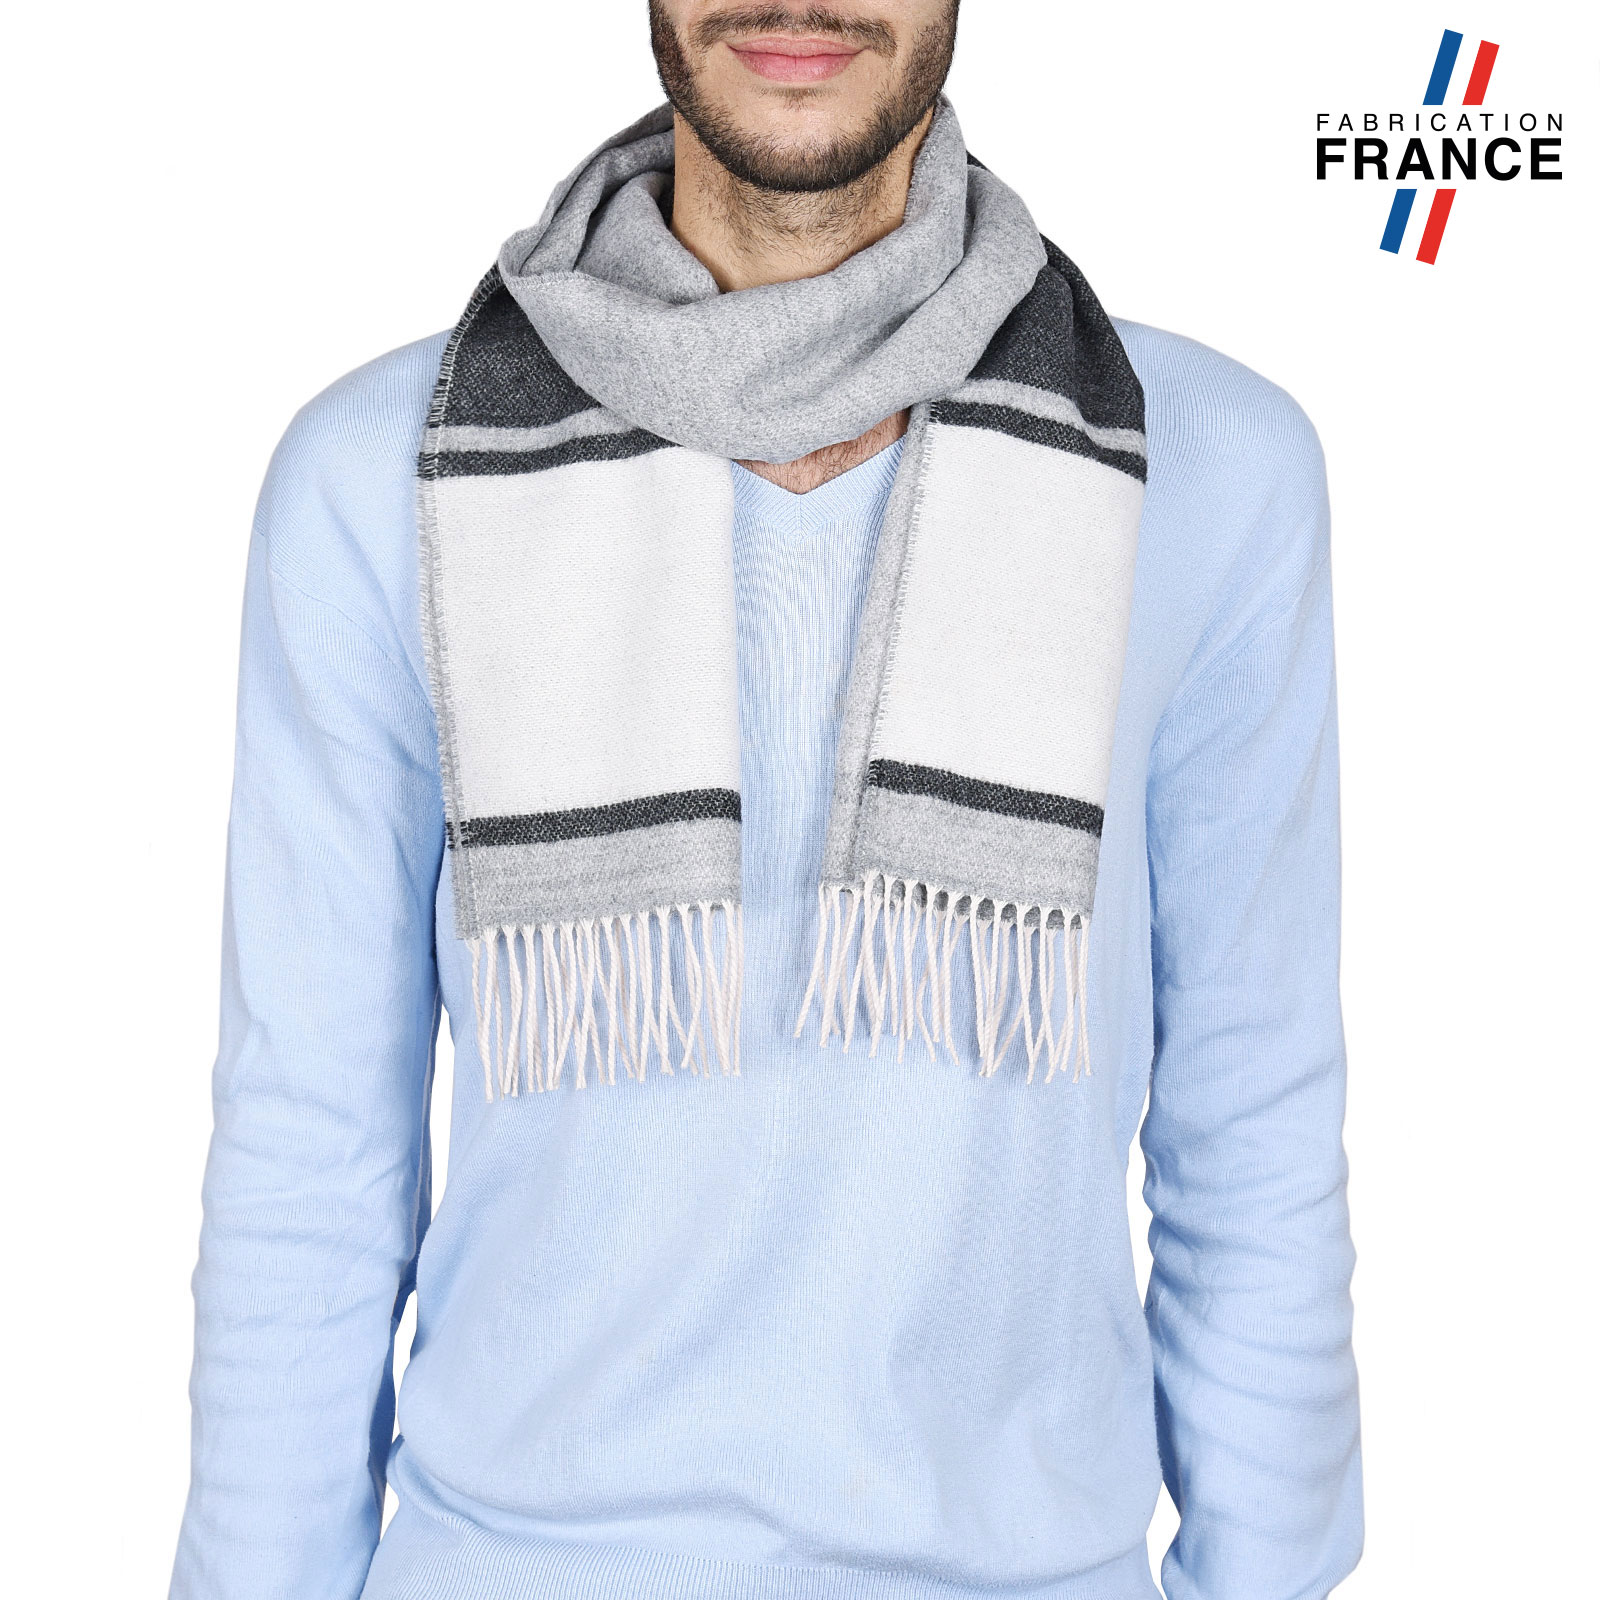 AT-03745-blanc-gris-echarpe-masculine-grise-blanche-W16